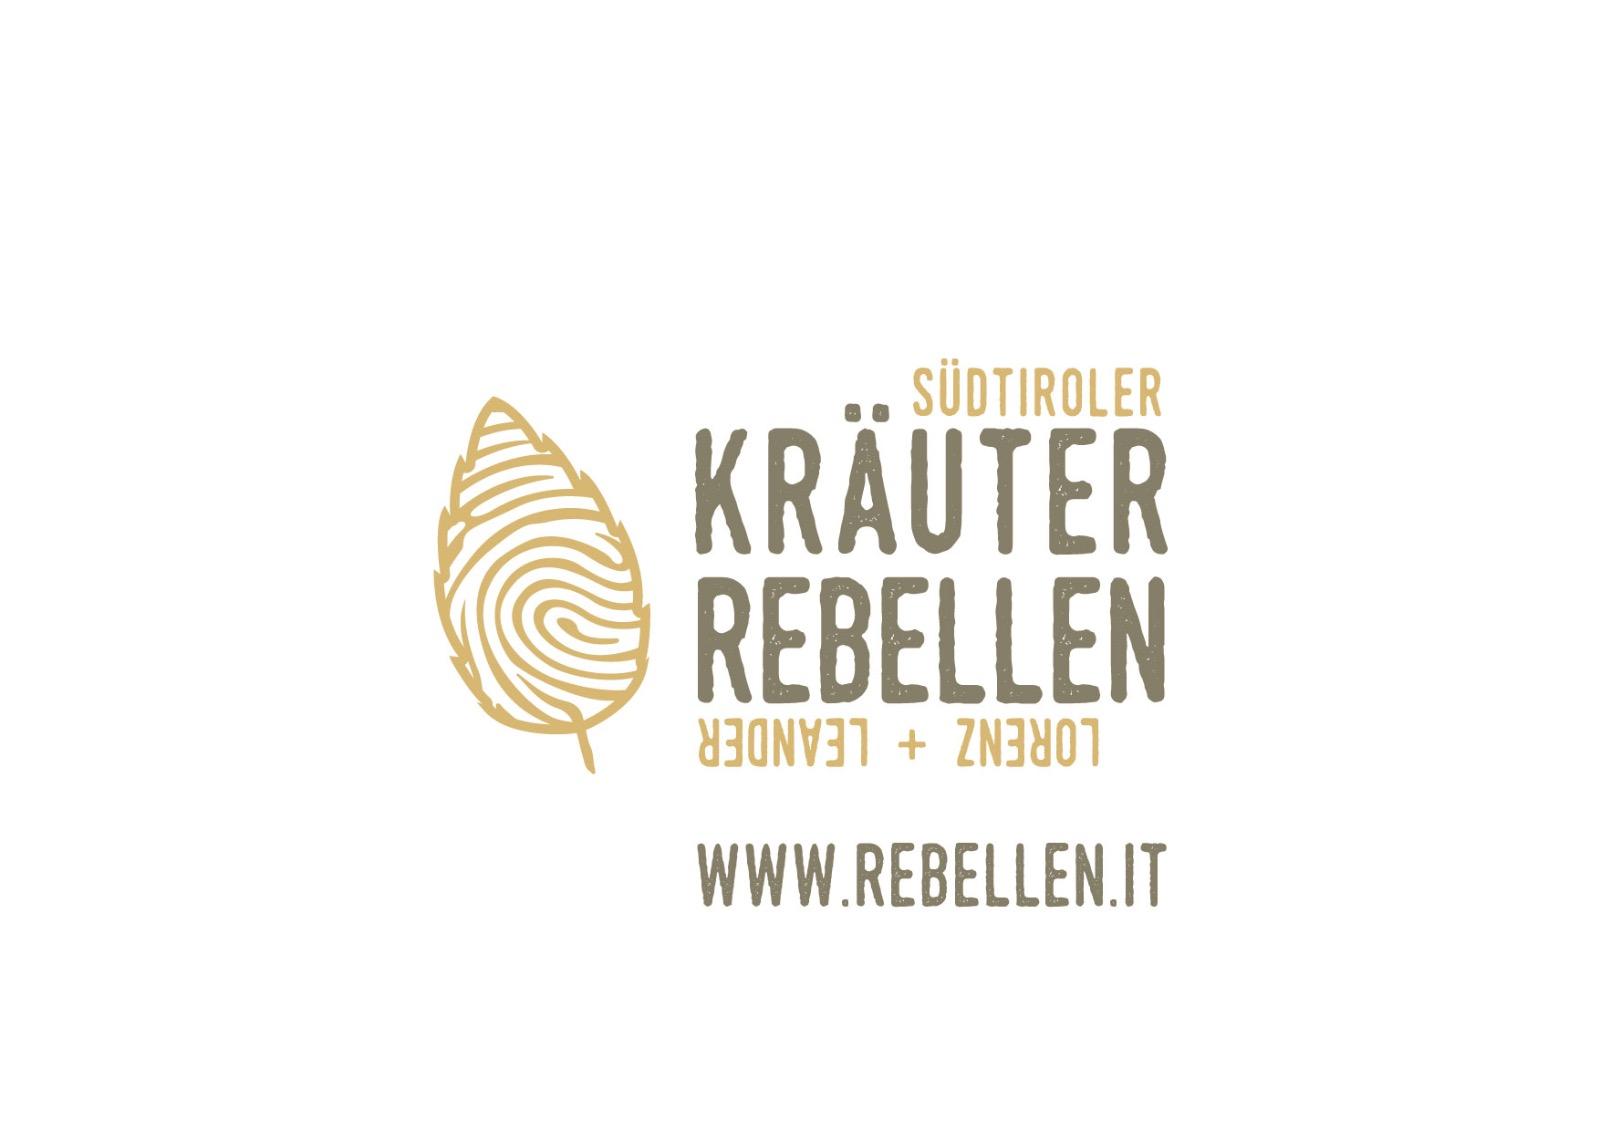 Südtiroler Kräuter Rebellen - Lorenz&Leander